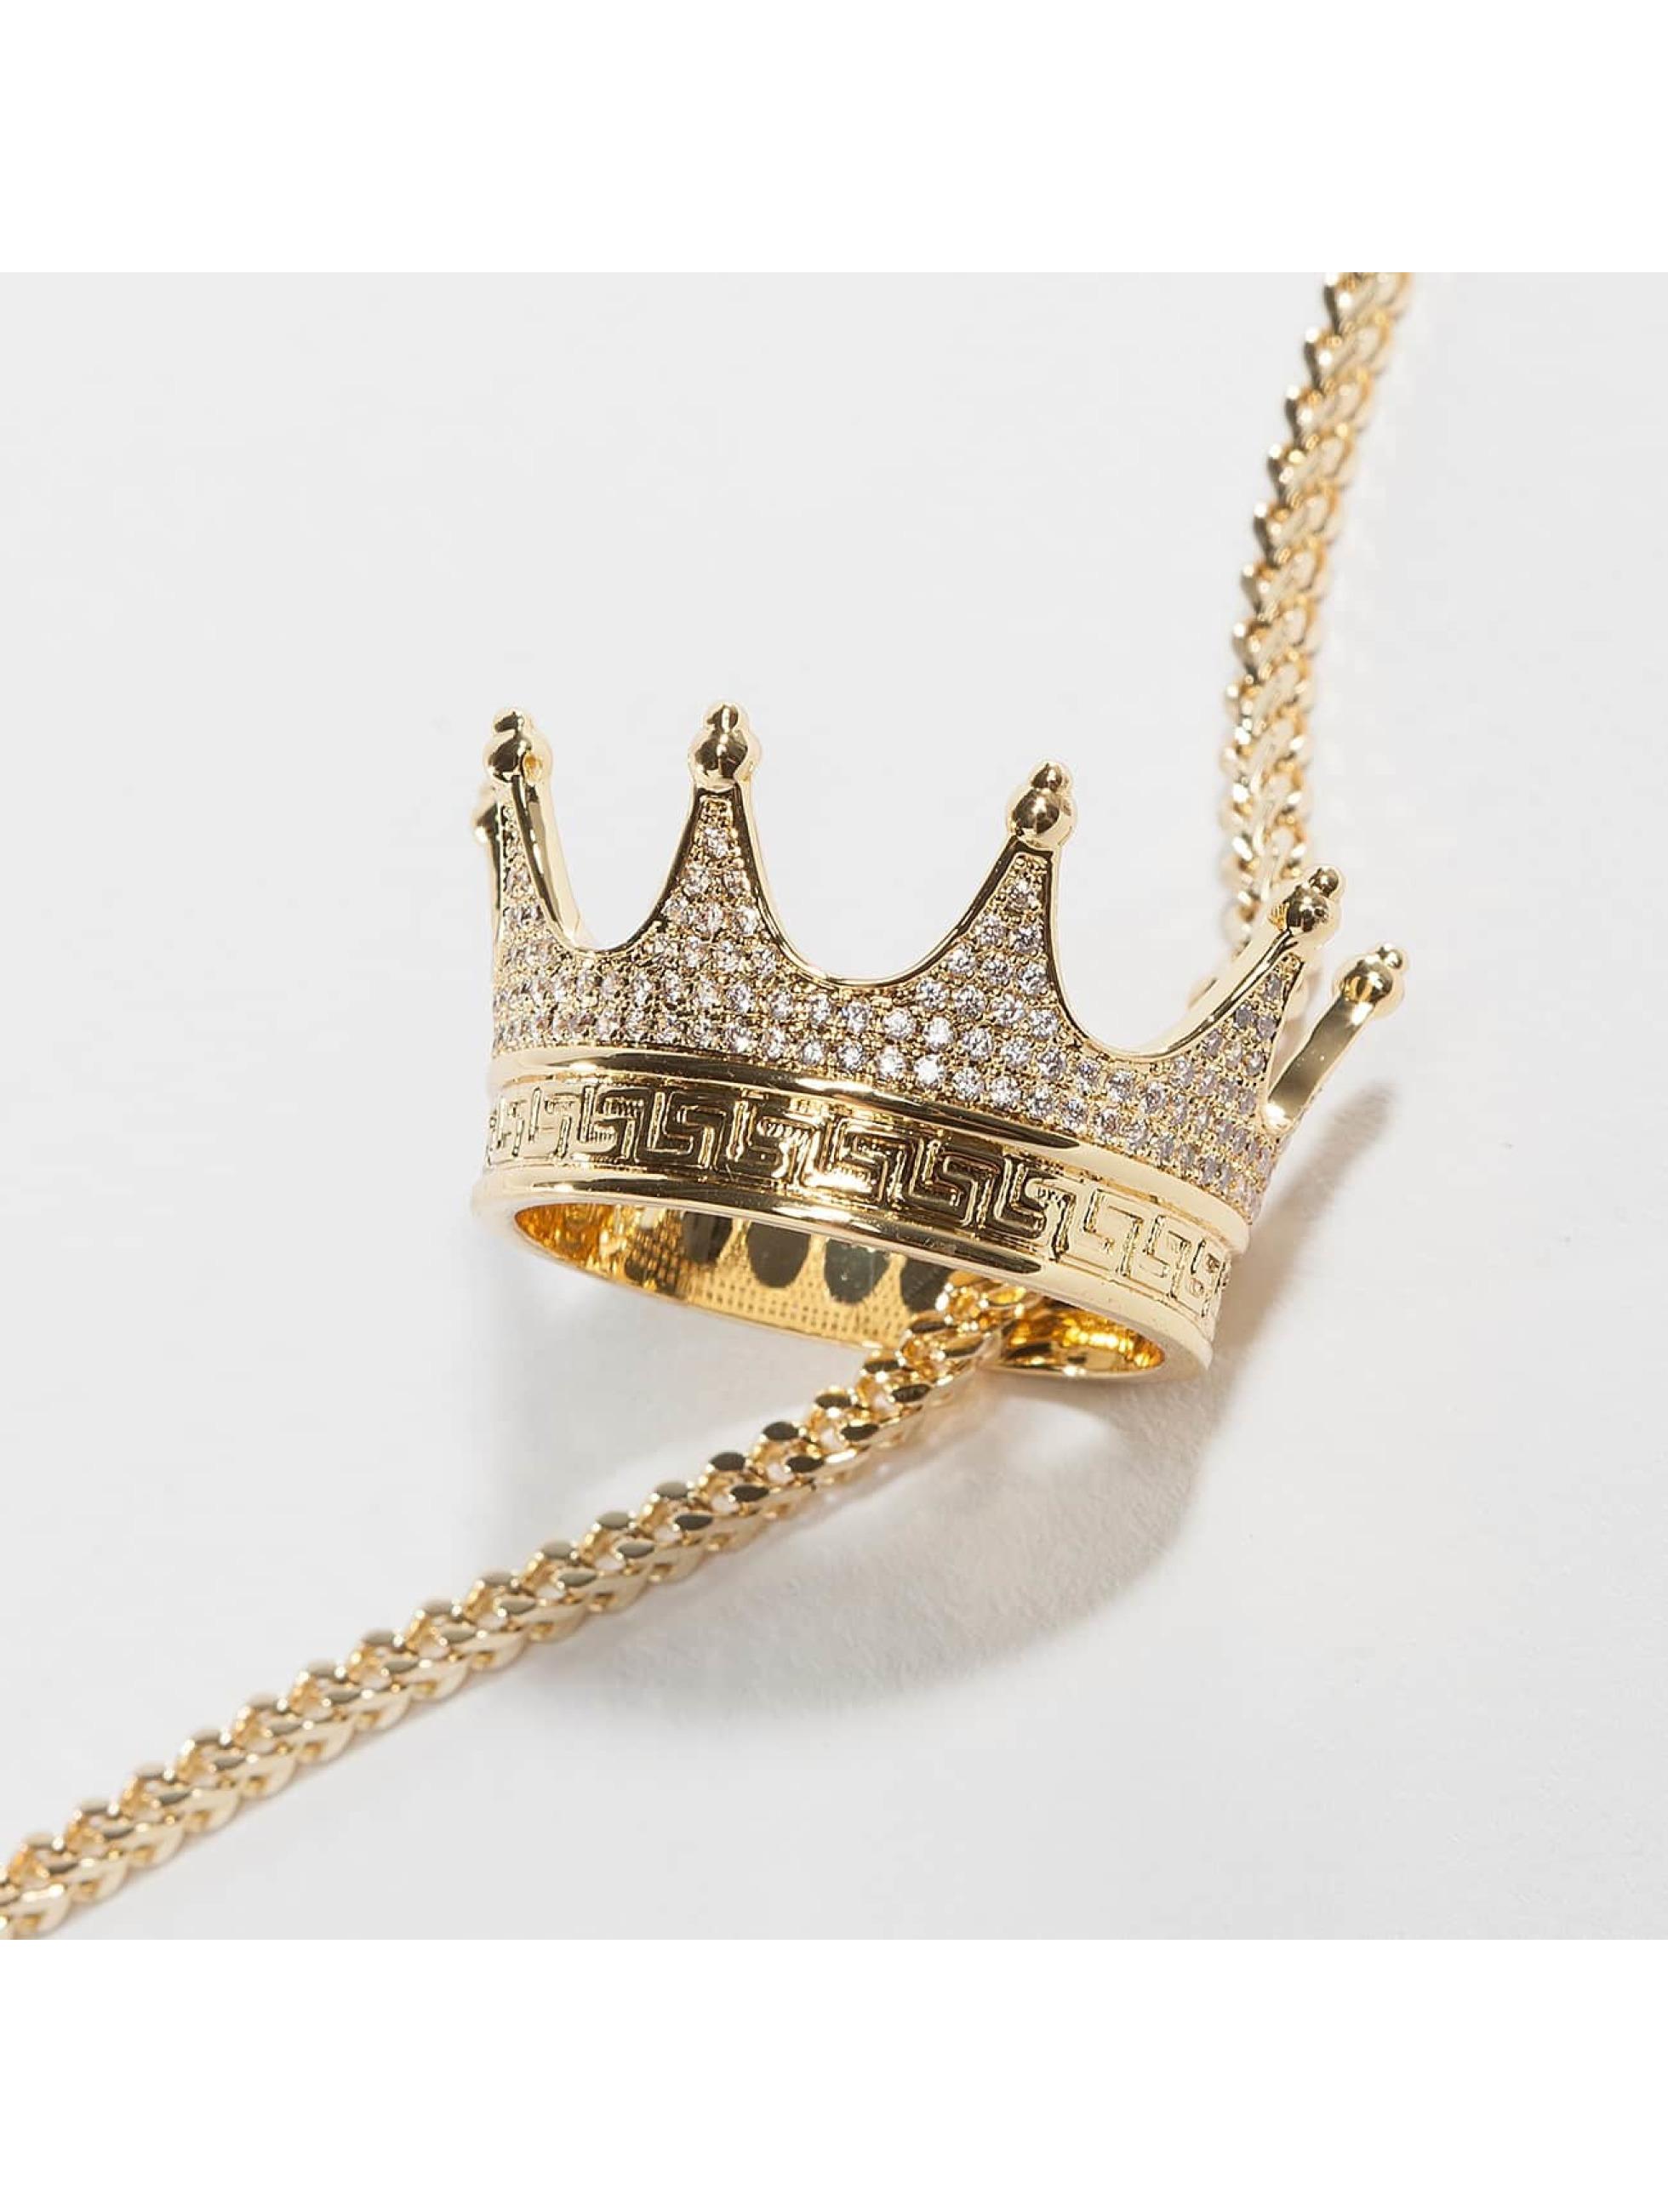 KING ICE Retiazky EMPIRE FOX Gold_Plated CZ Small Lucious Lyon zlatá